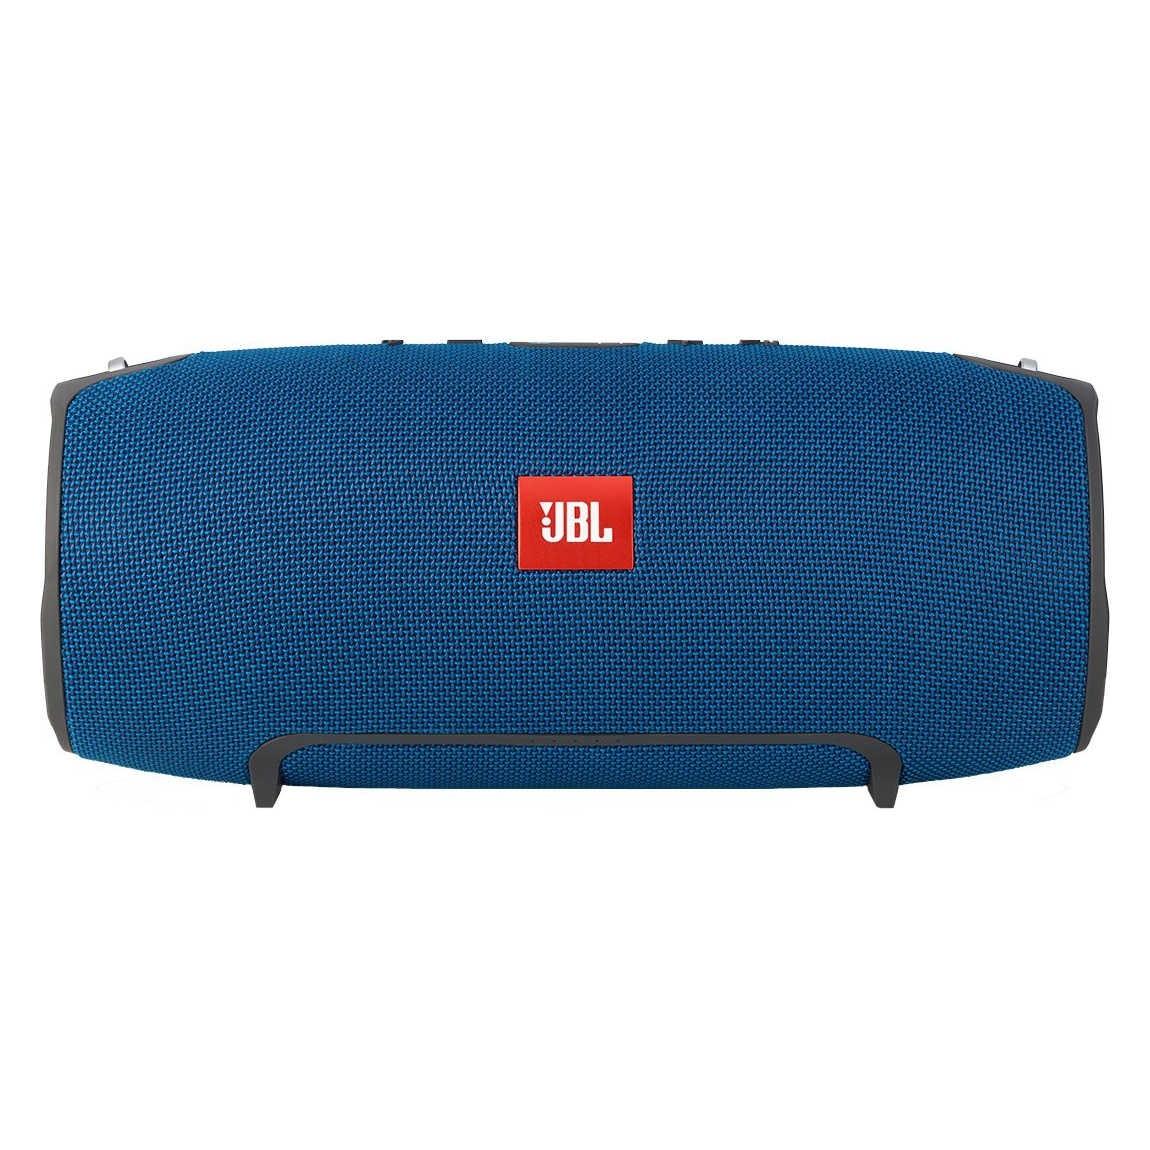 JBL Xtreme - Bluetooth-Lautsprecher - Blau